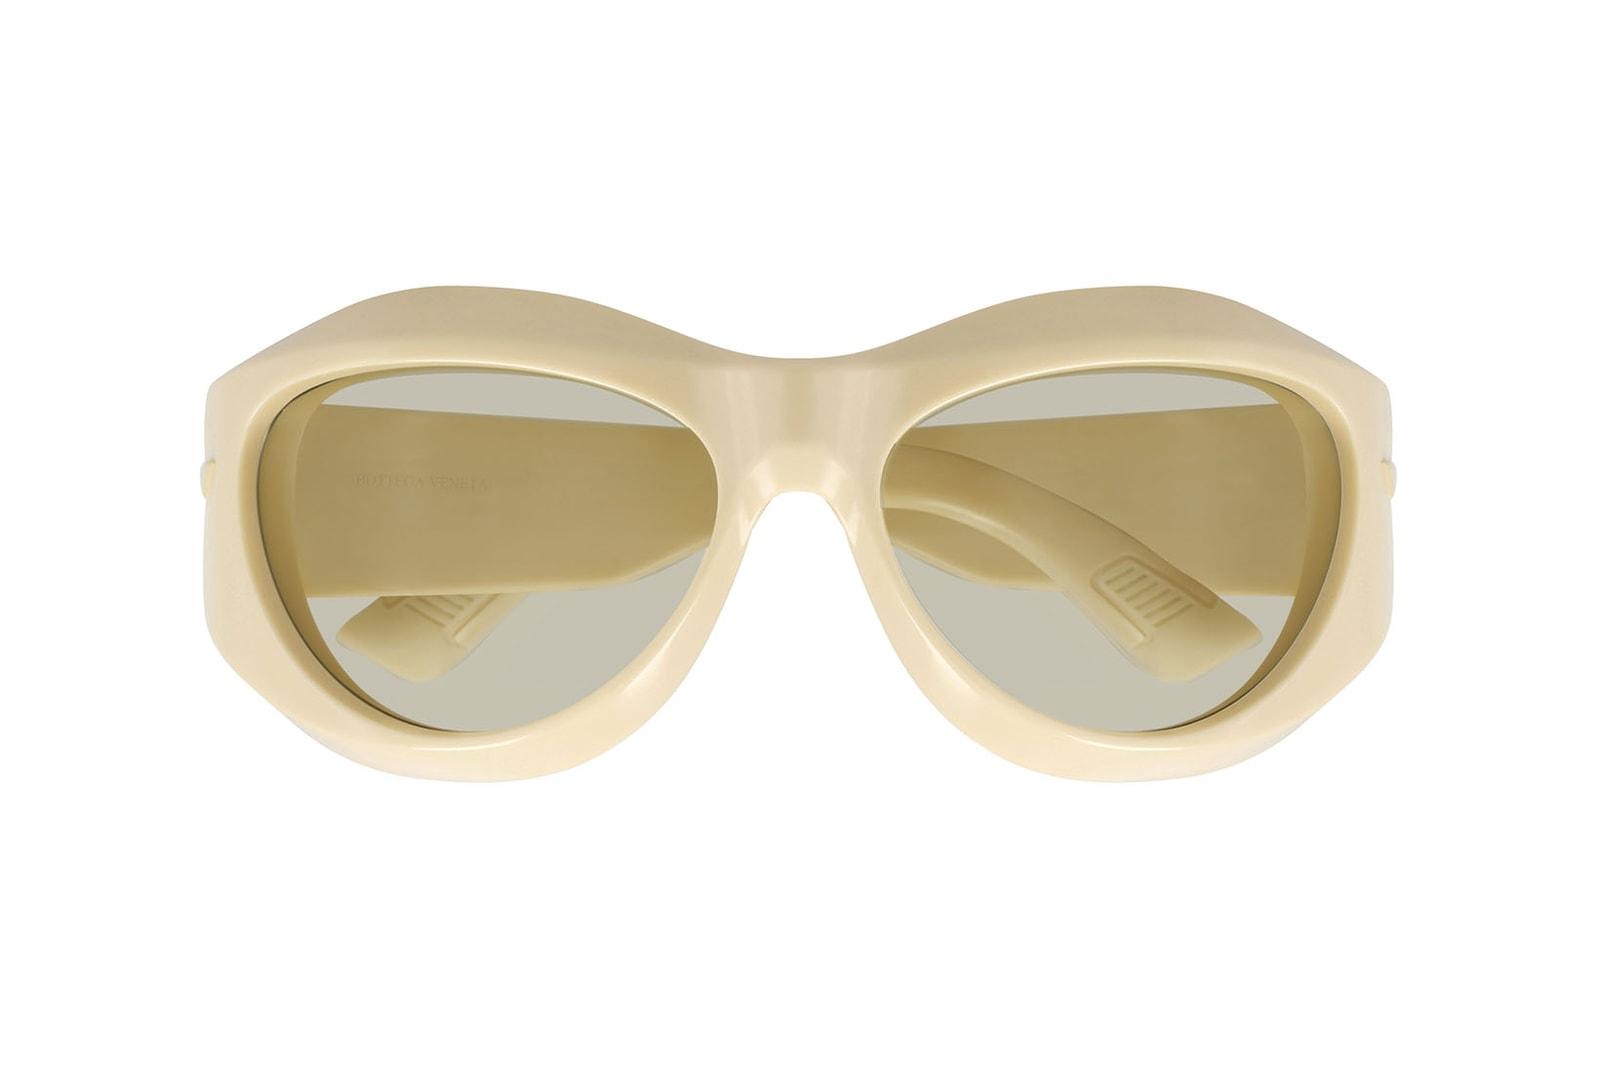 Bottega Veneta Fall/Winter 2020 Sunglasses Eyewear Collection Original Black